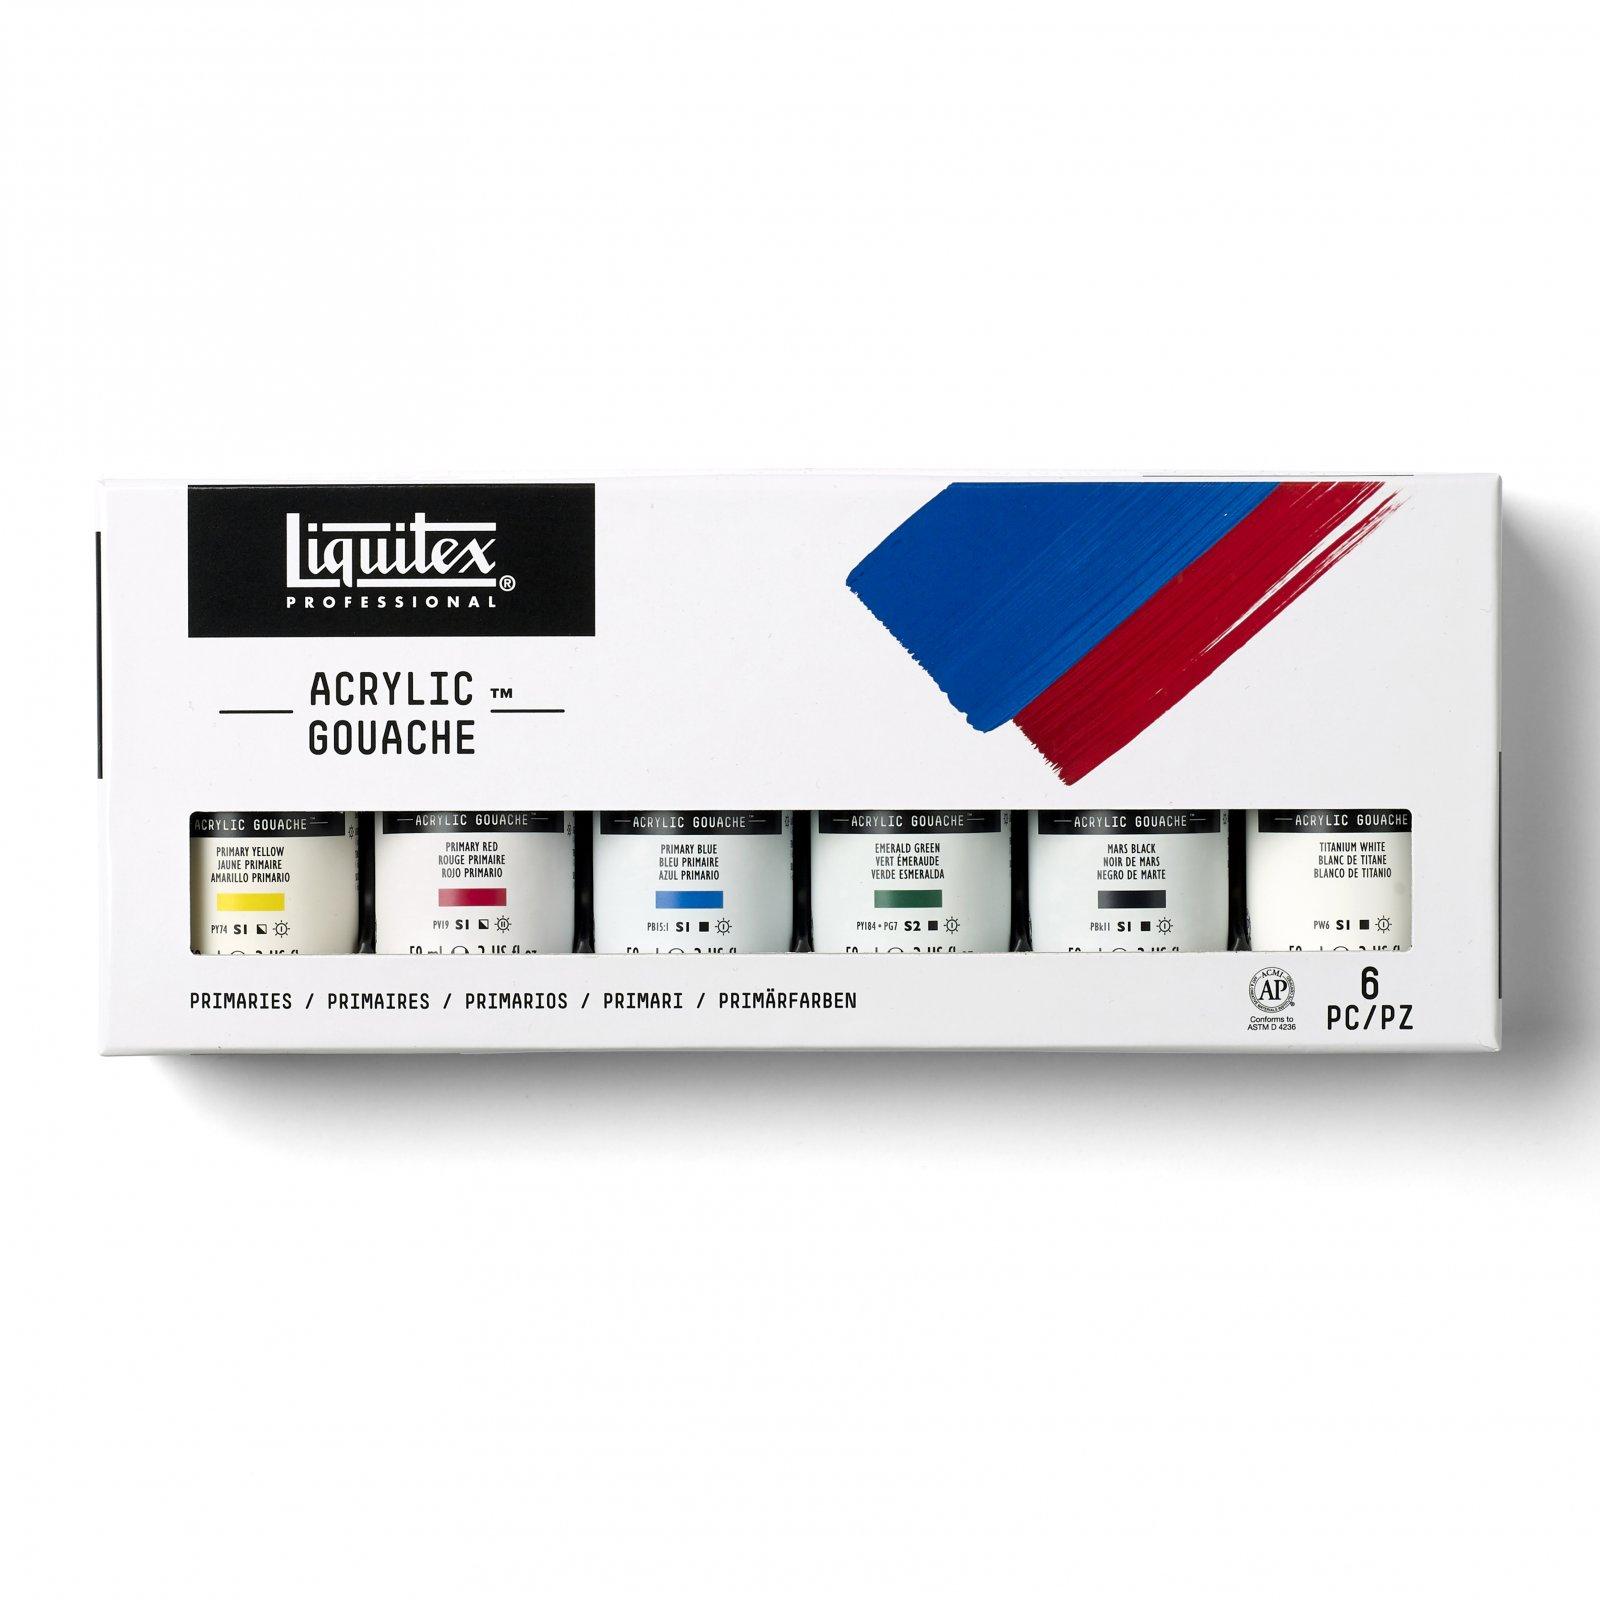 Liquitex Acrylic Gouache Sets